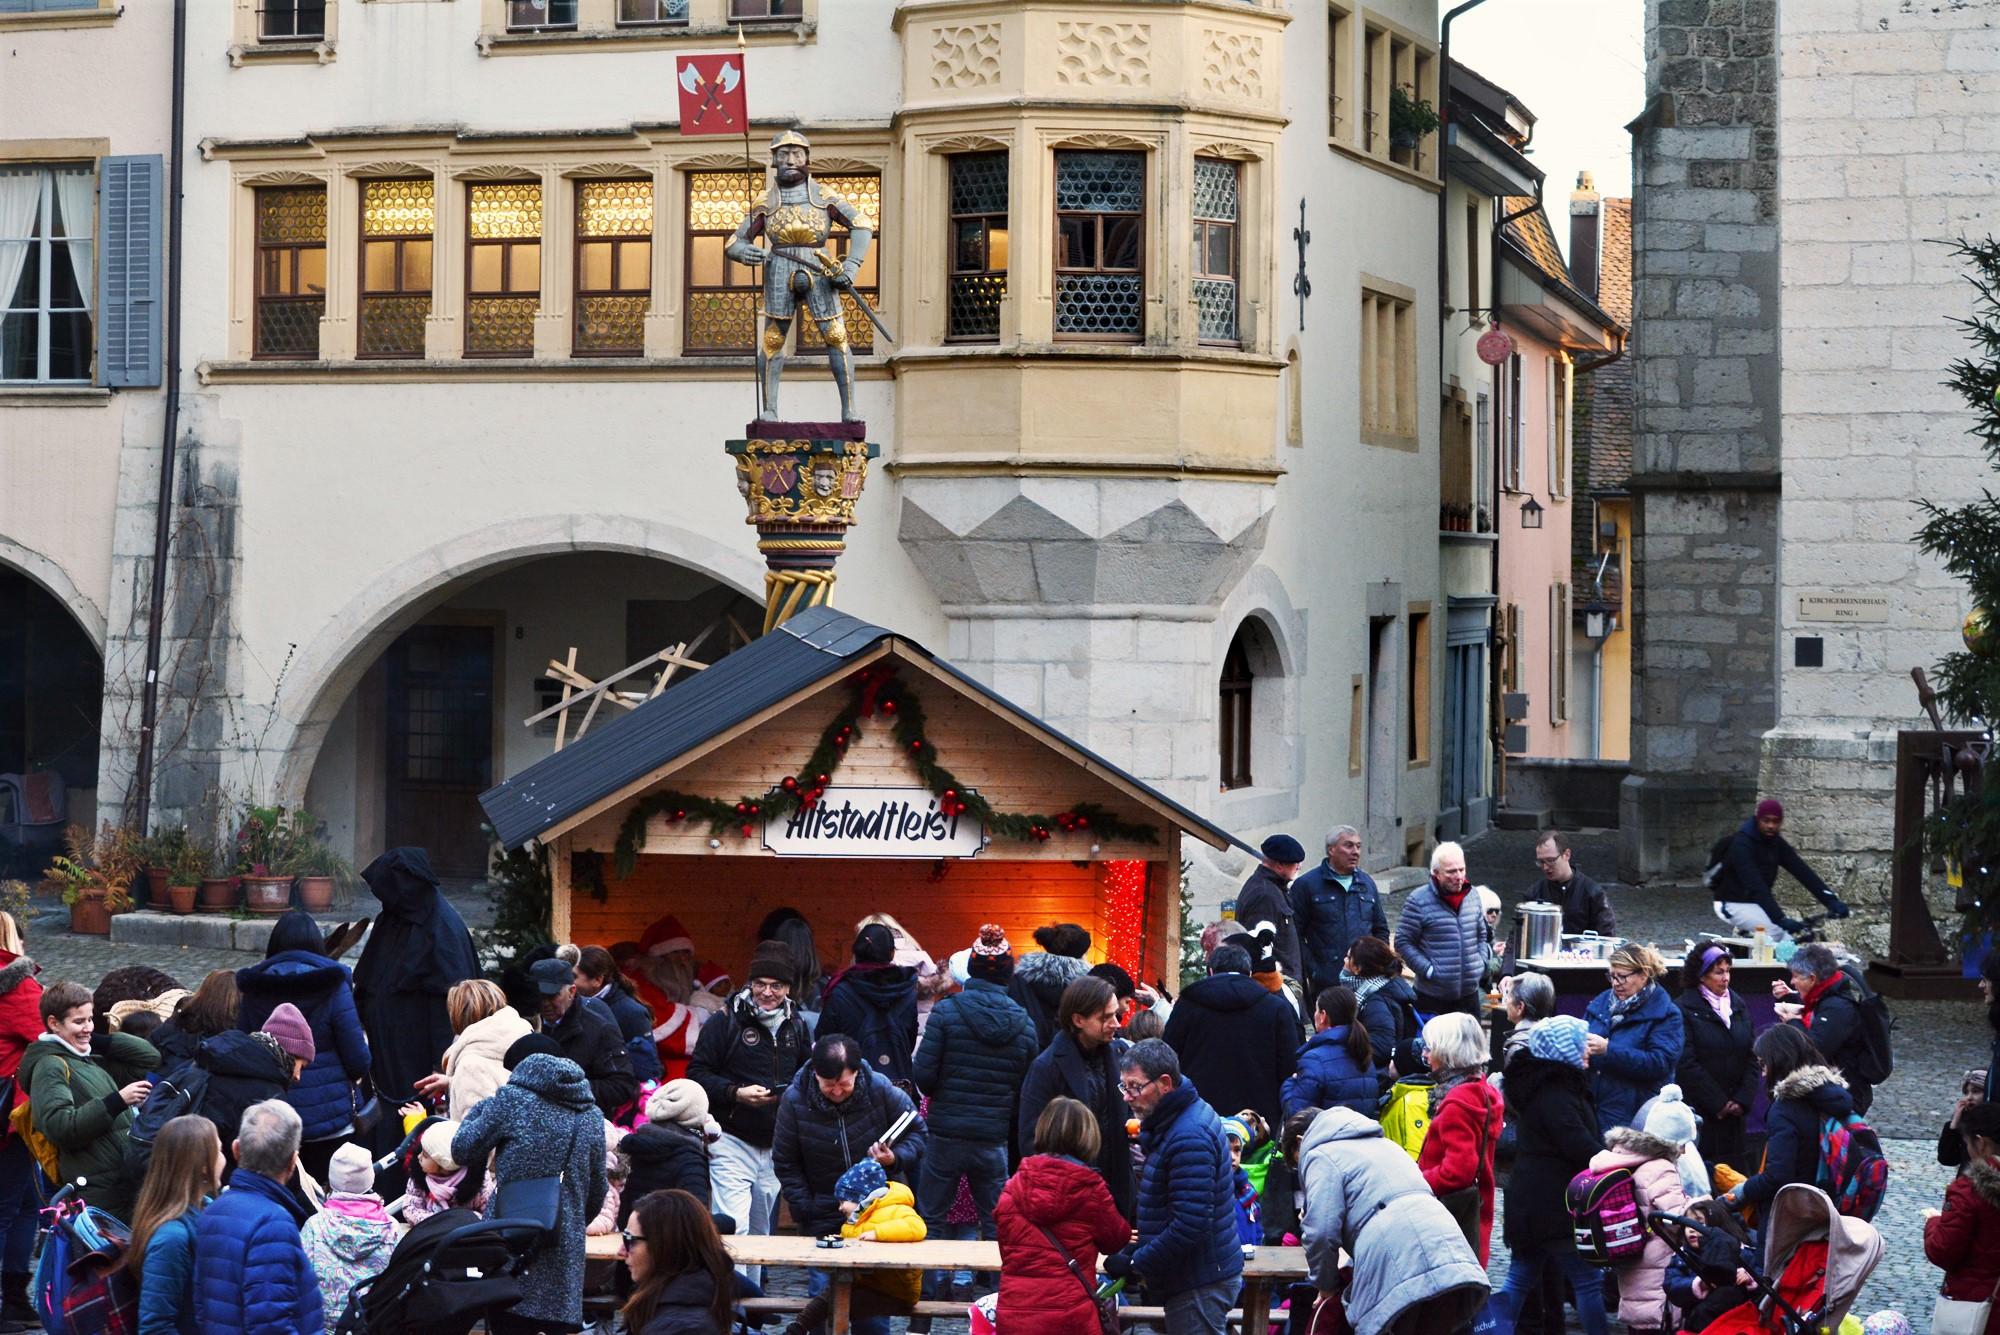 Altstadt-Samichlous auf dem Ring in der Bieler Altstadt (10.12,2019)